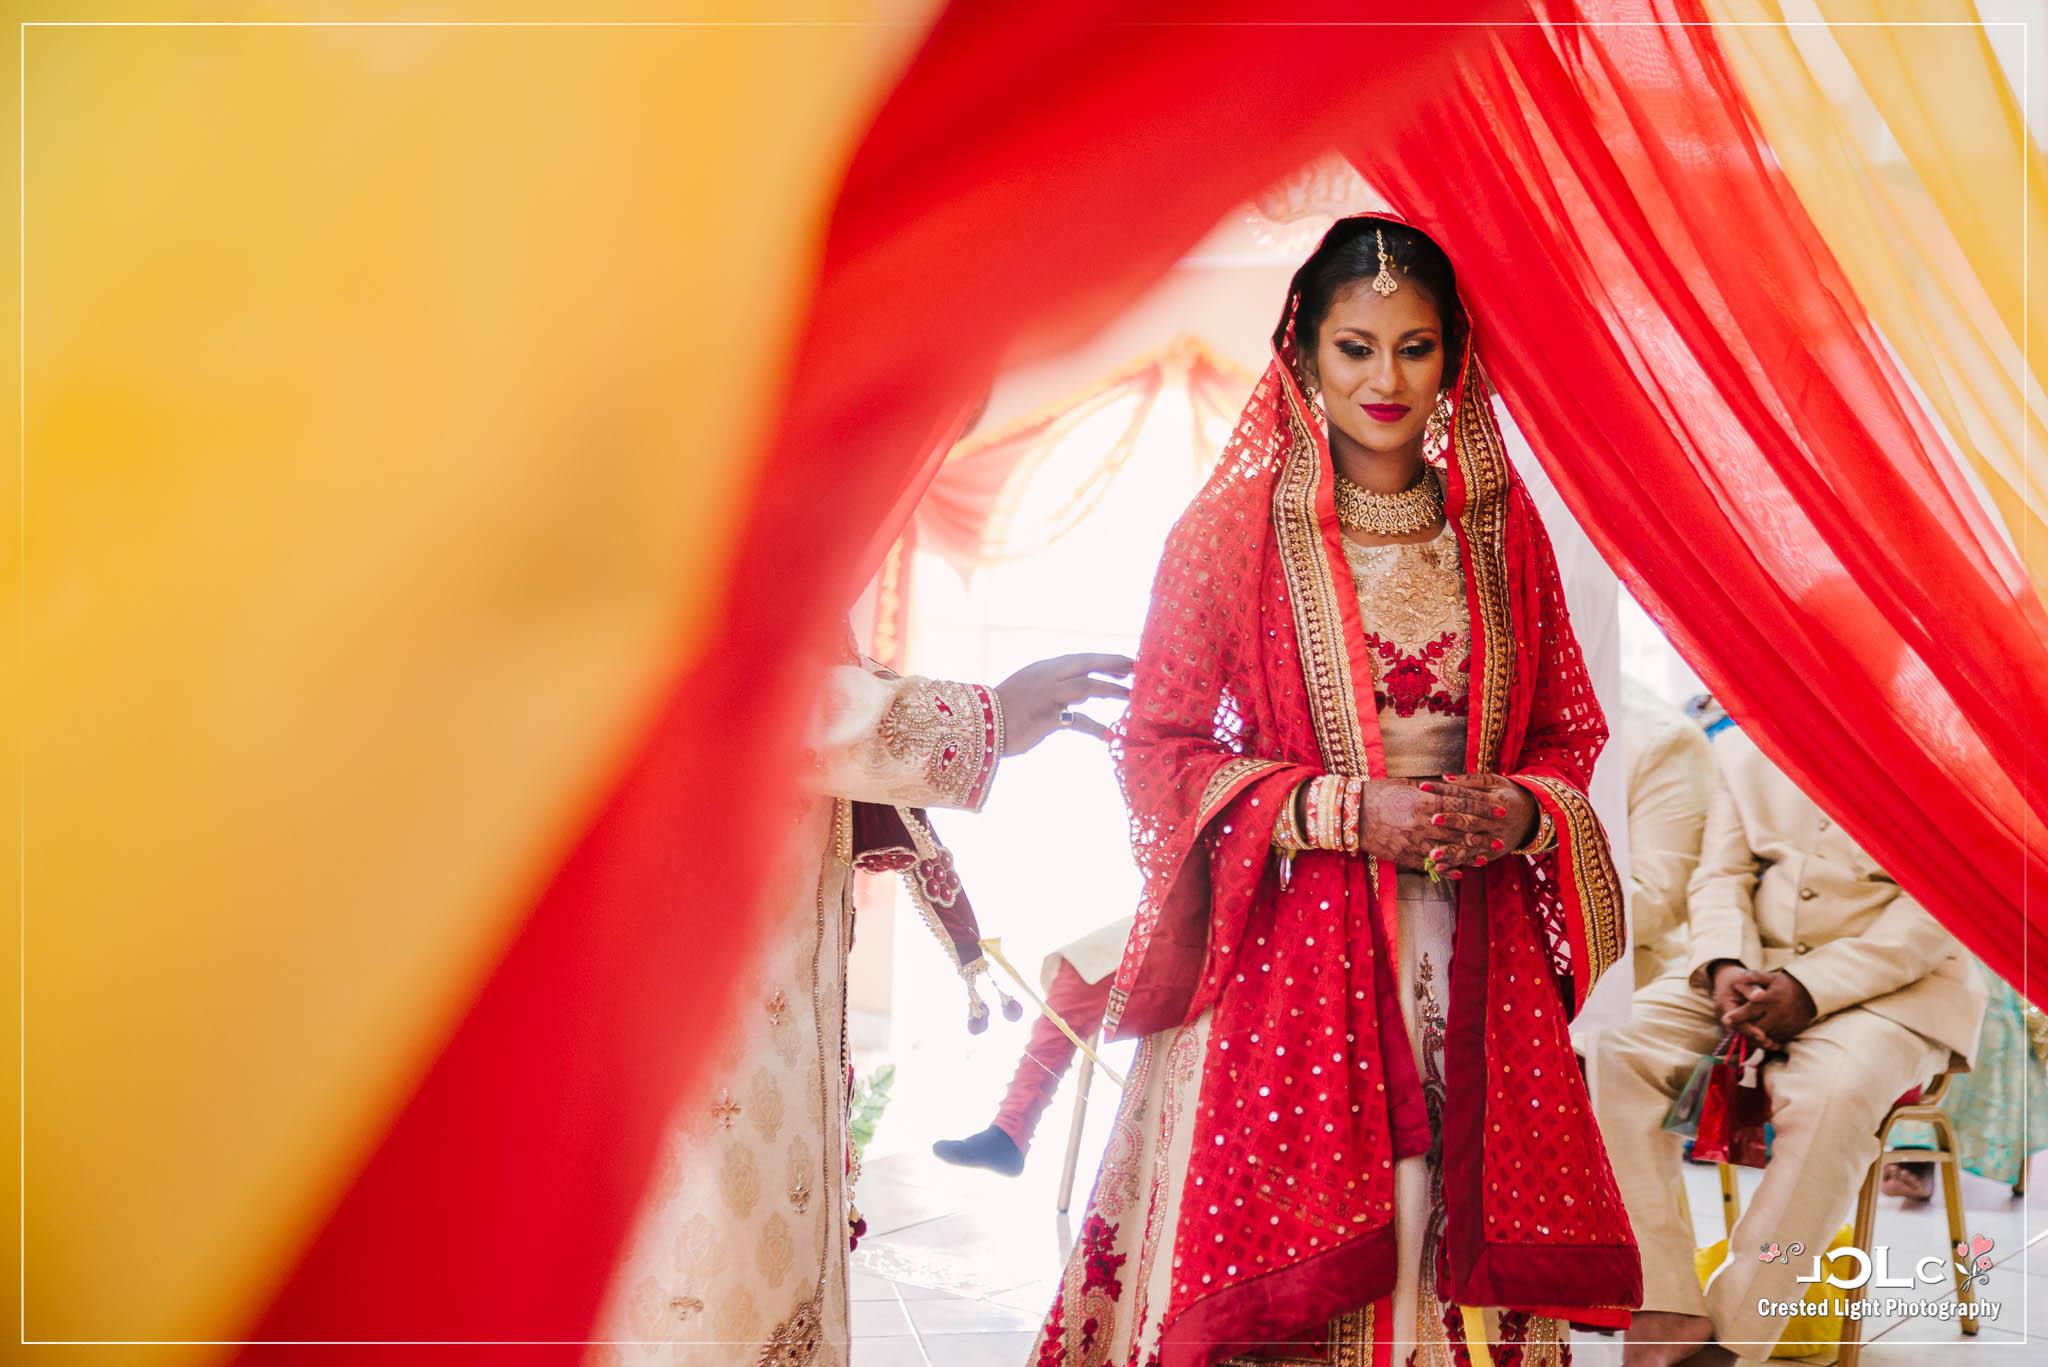 Devi mandir Trinidad Hindu wedding 24.jpg